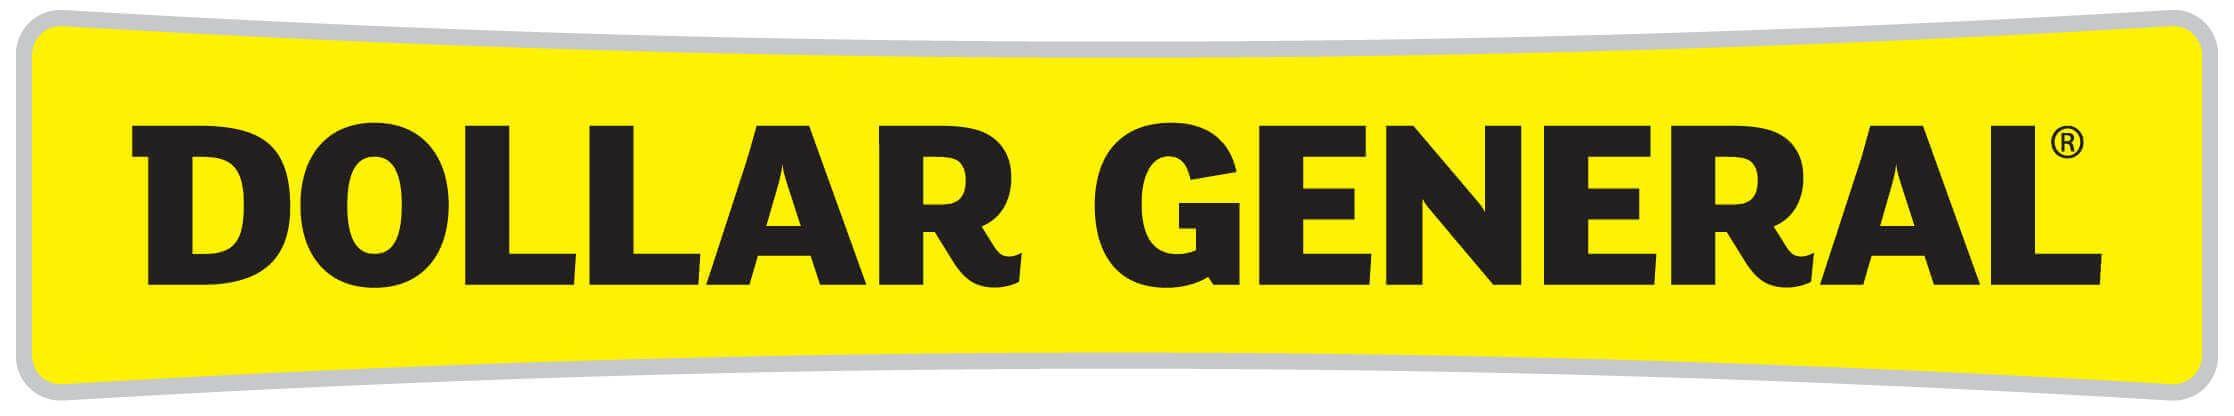 DGLogoWGray22409